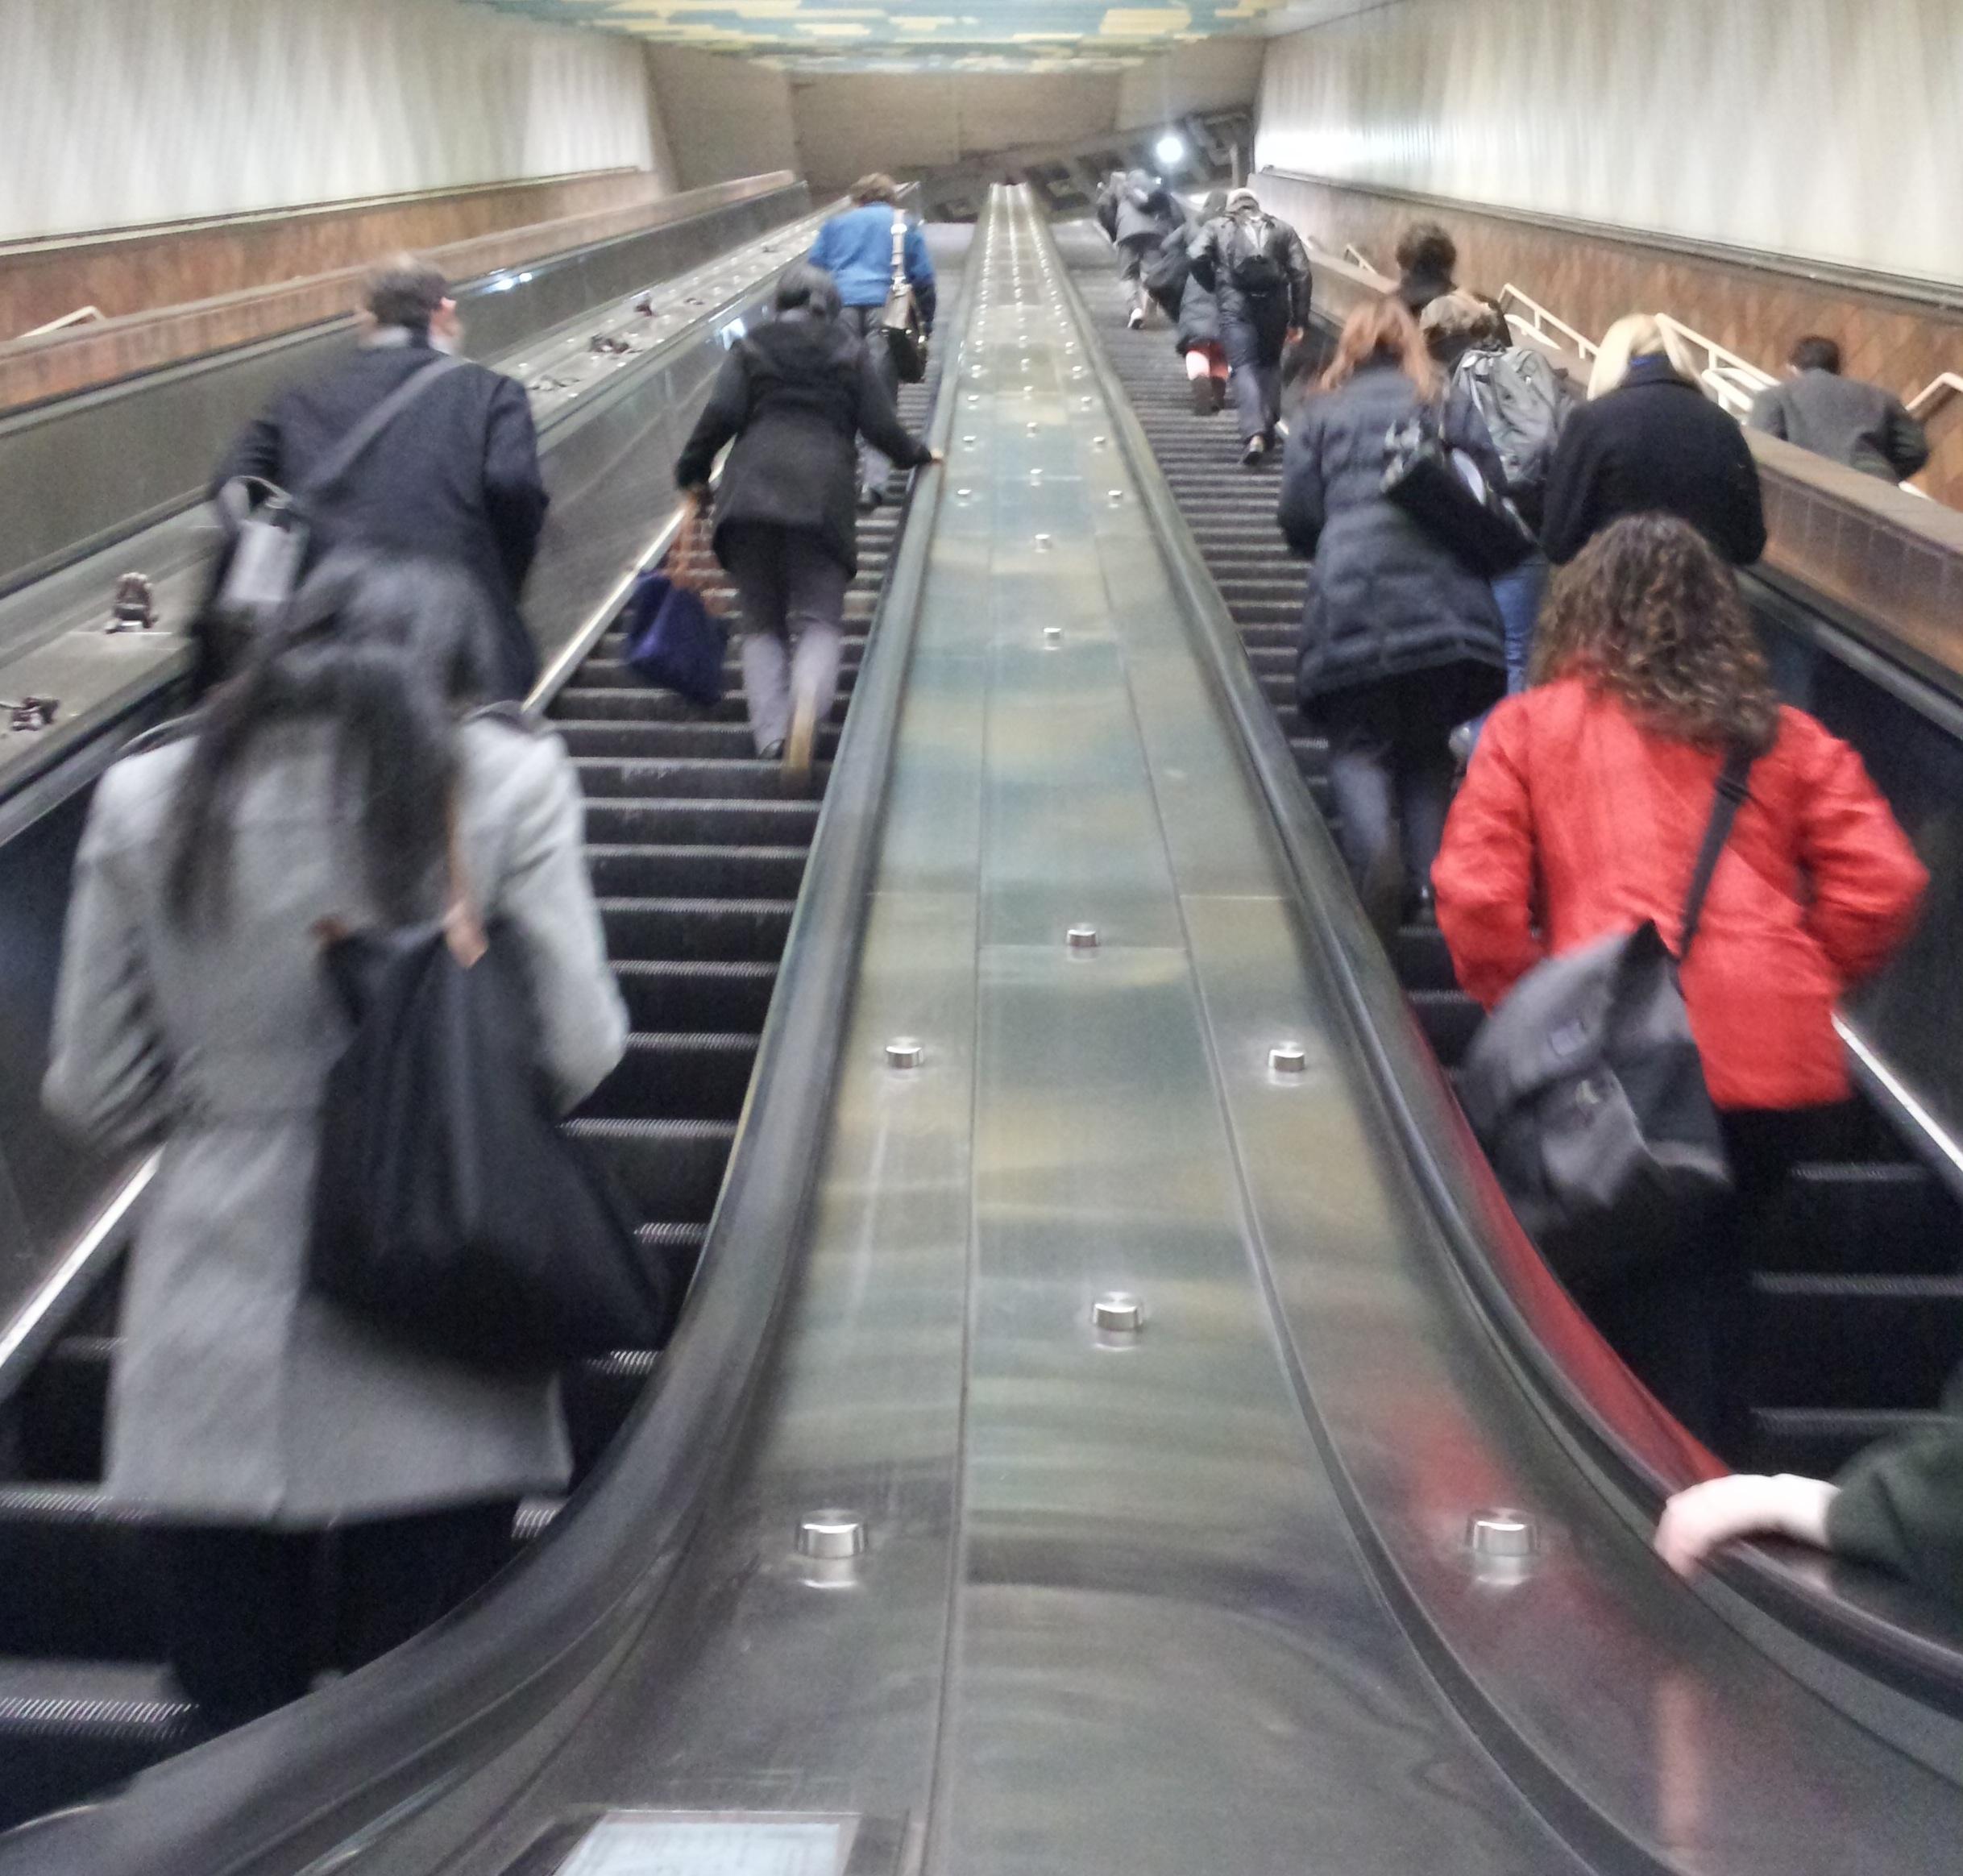 Airport Escalator